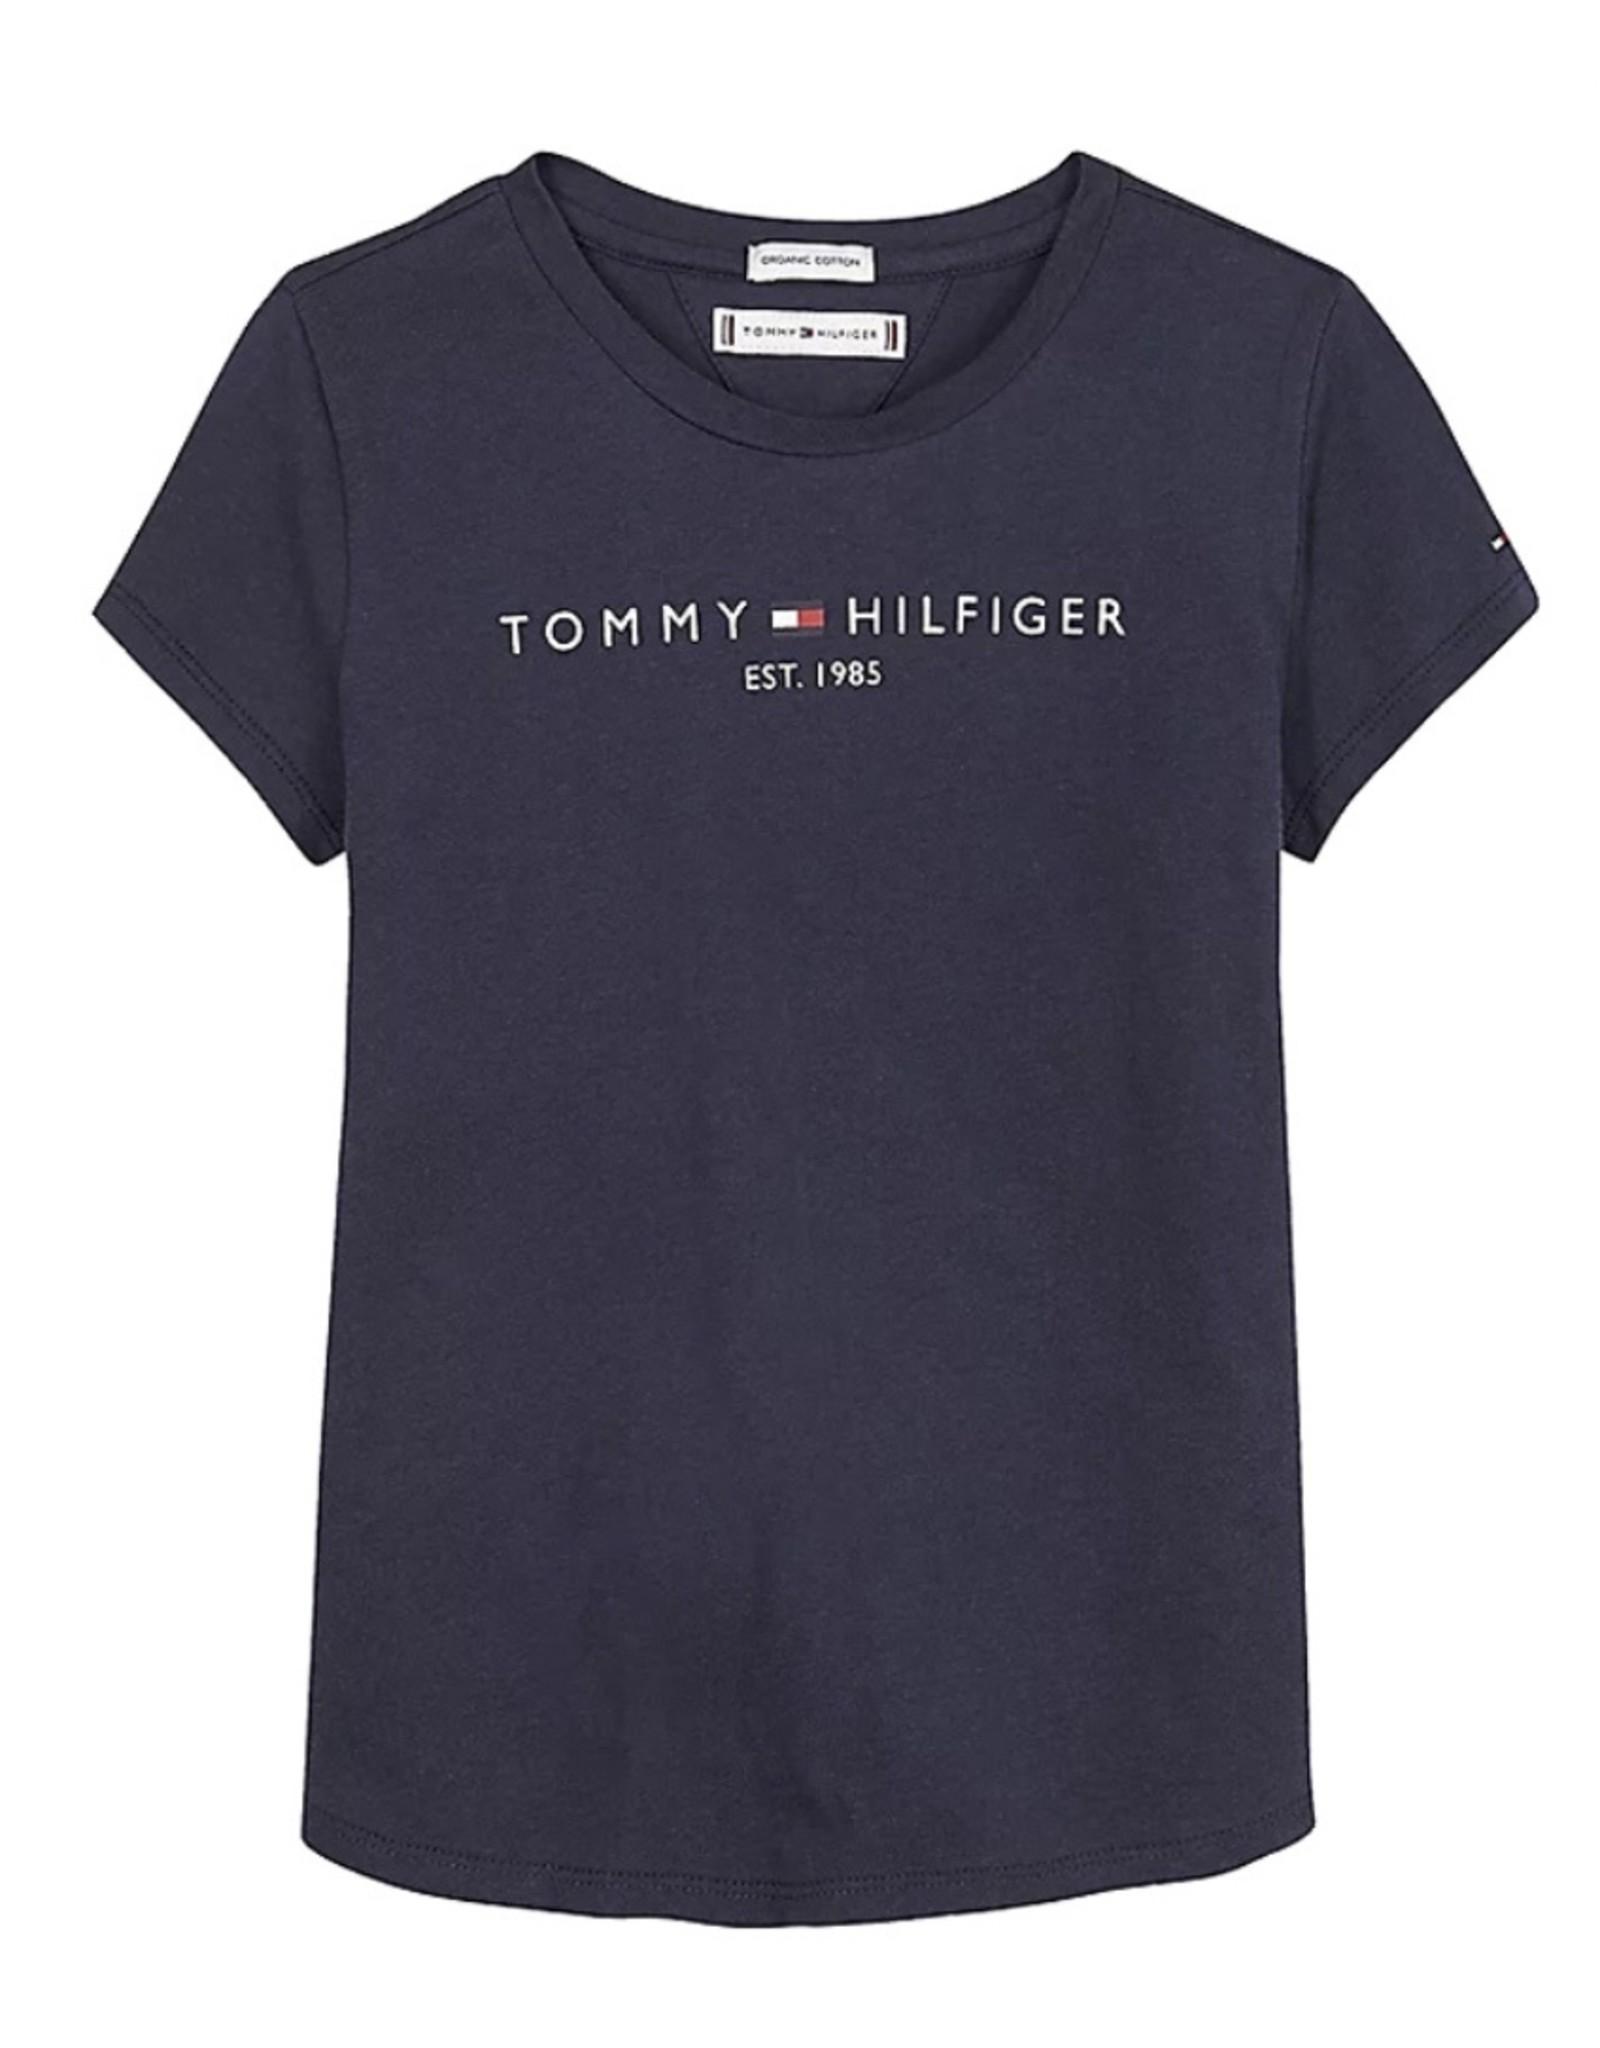 Tommy Hilfiger 5242 T-Shirt